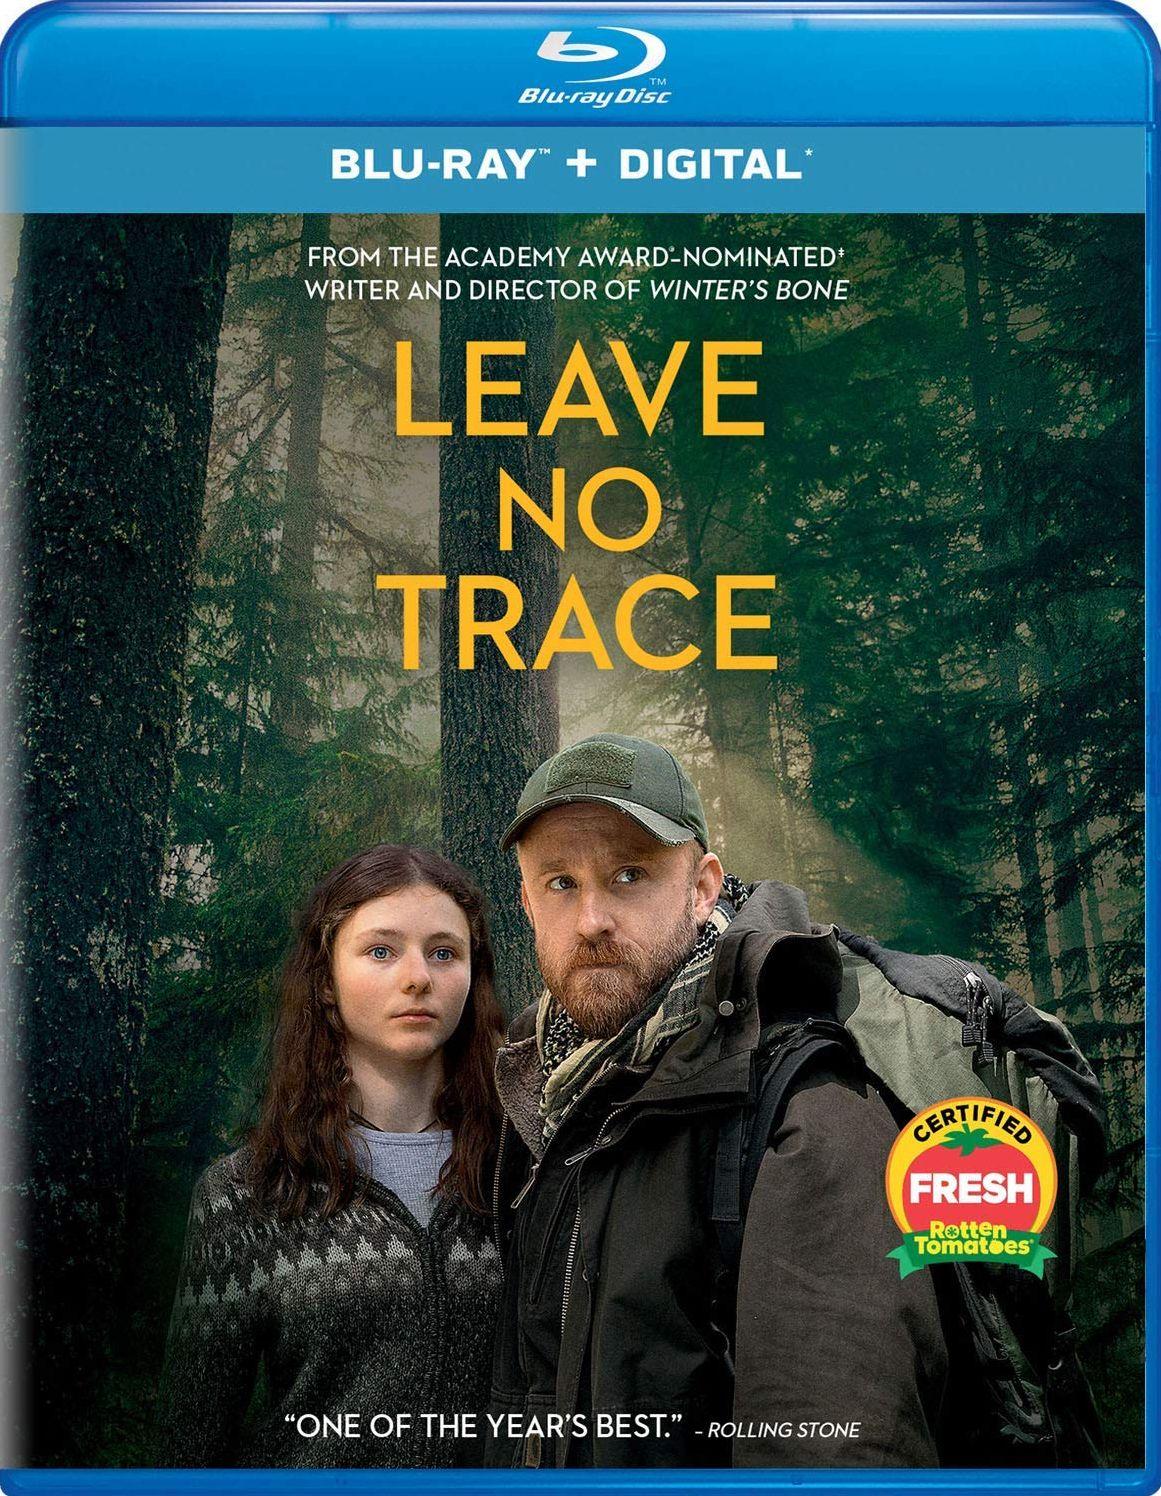 LEAVE NO TRACE BLURAY (UNIVERSAL STUDIOS) Blu ray